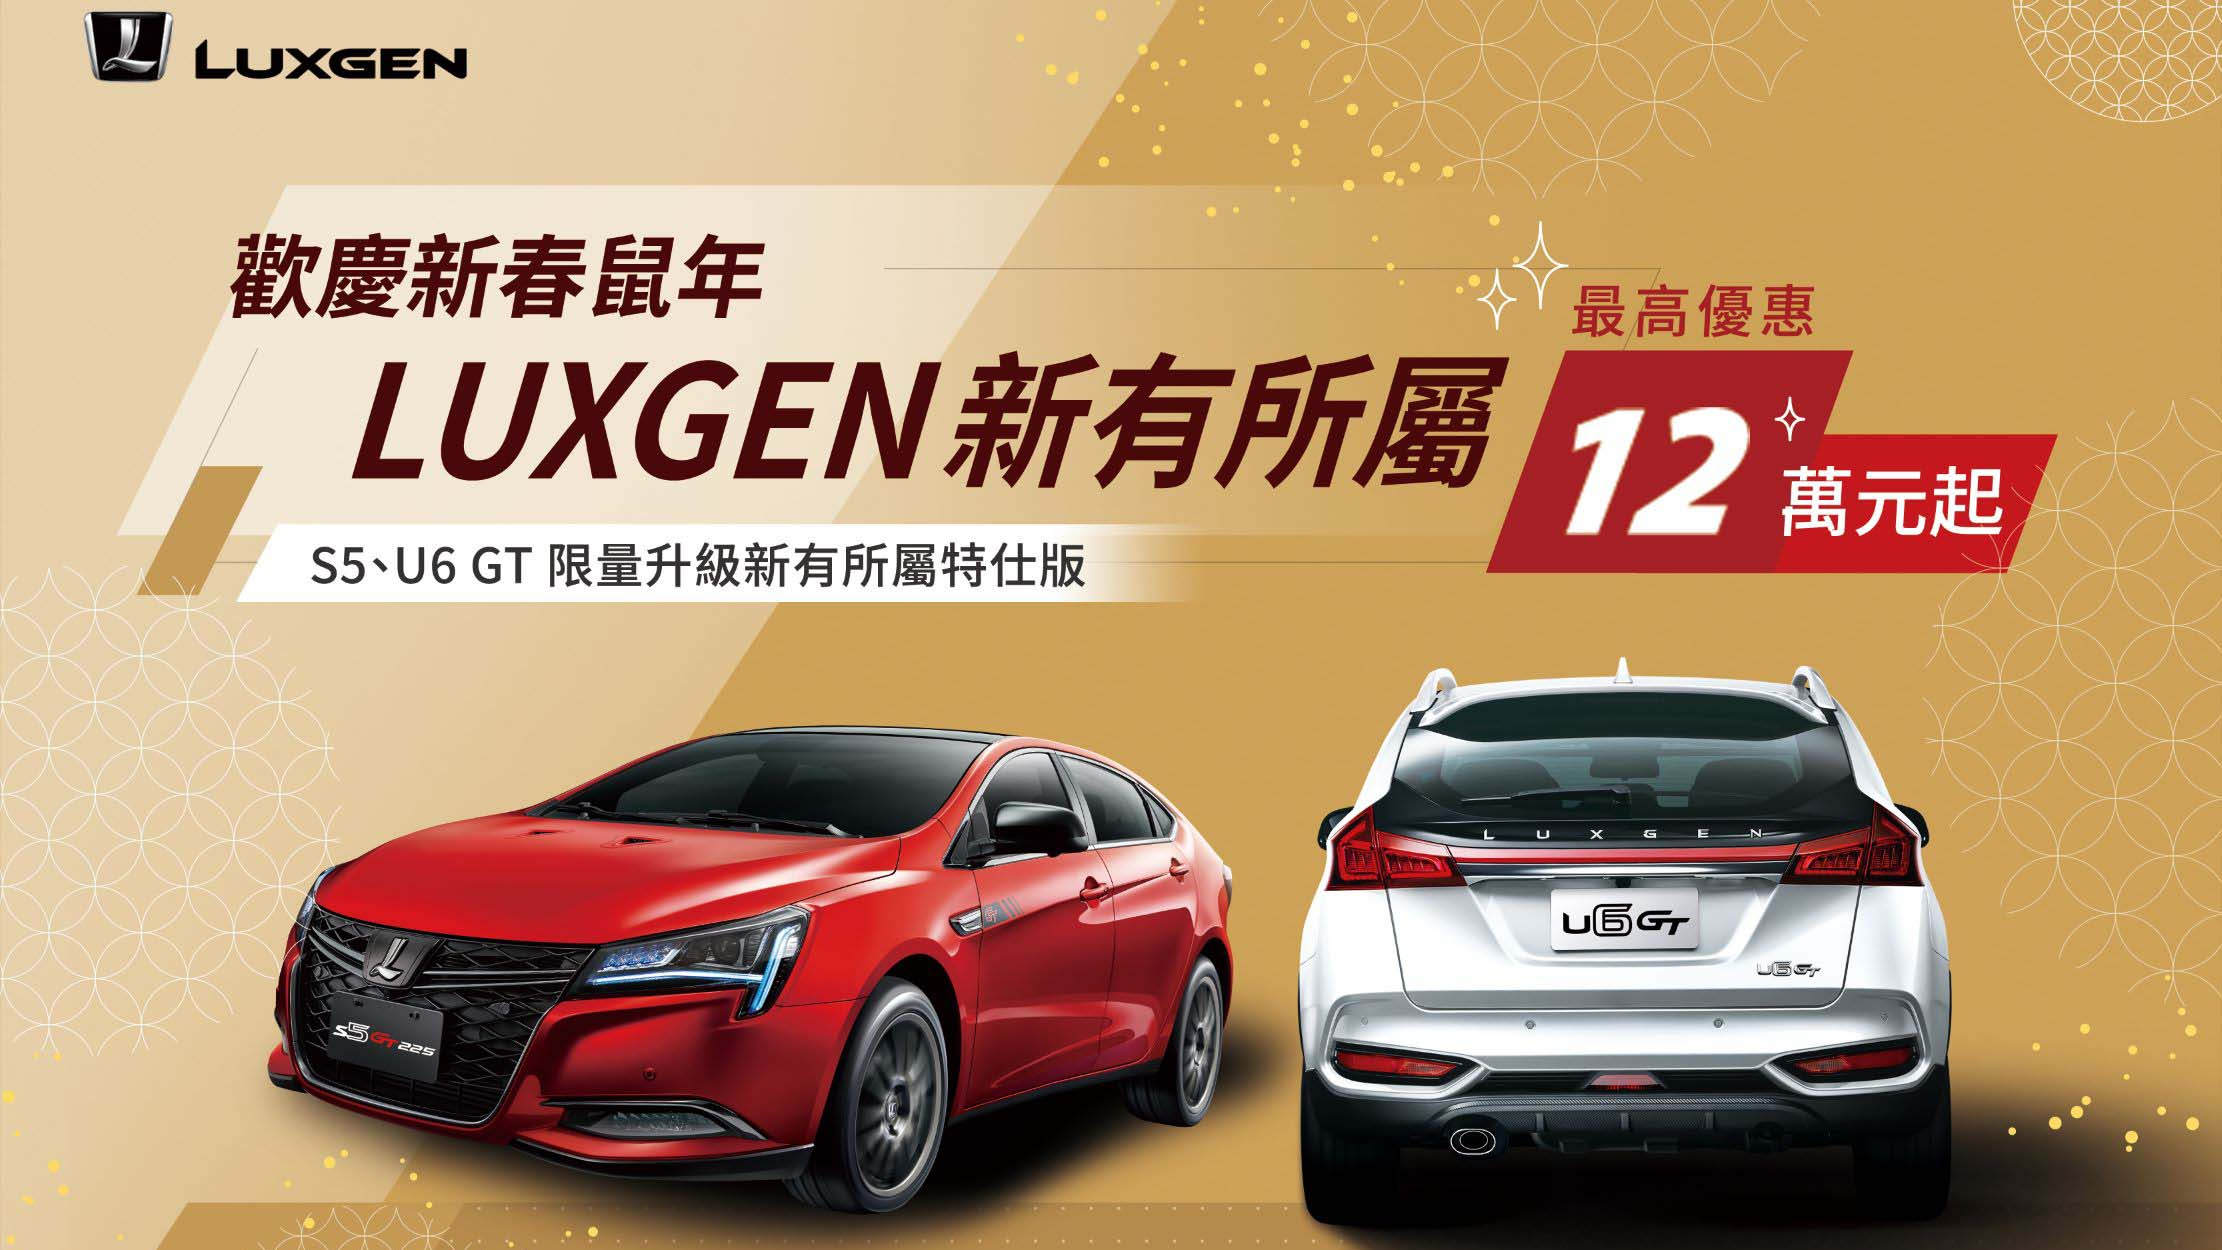 Luxgen 二月優惠最高 12 萬元!交車再送 6 年 6 大系統延長保固